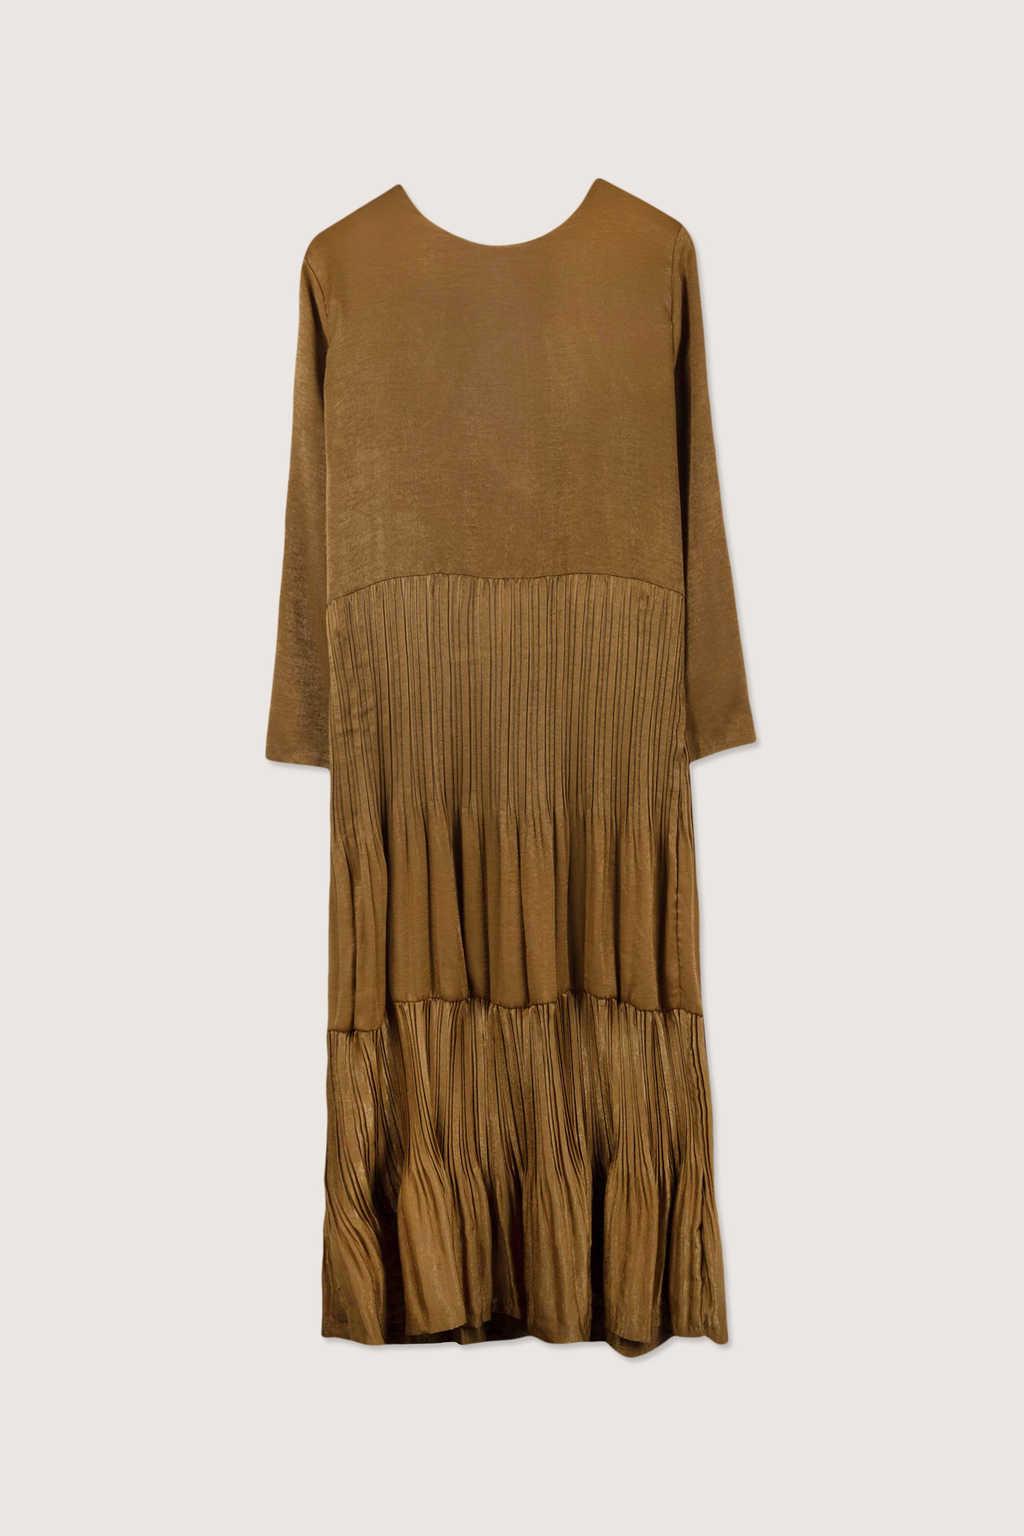 Dress H345 Beige 14